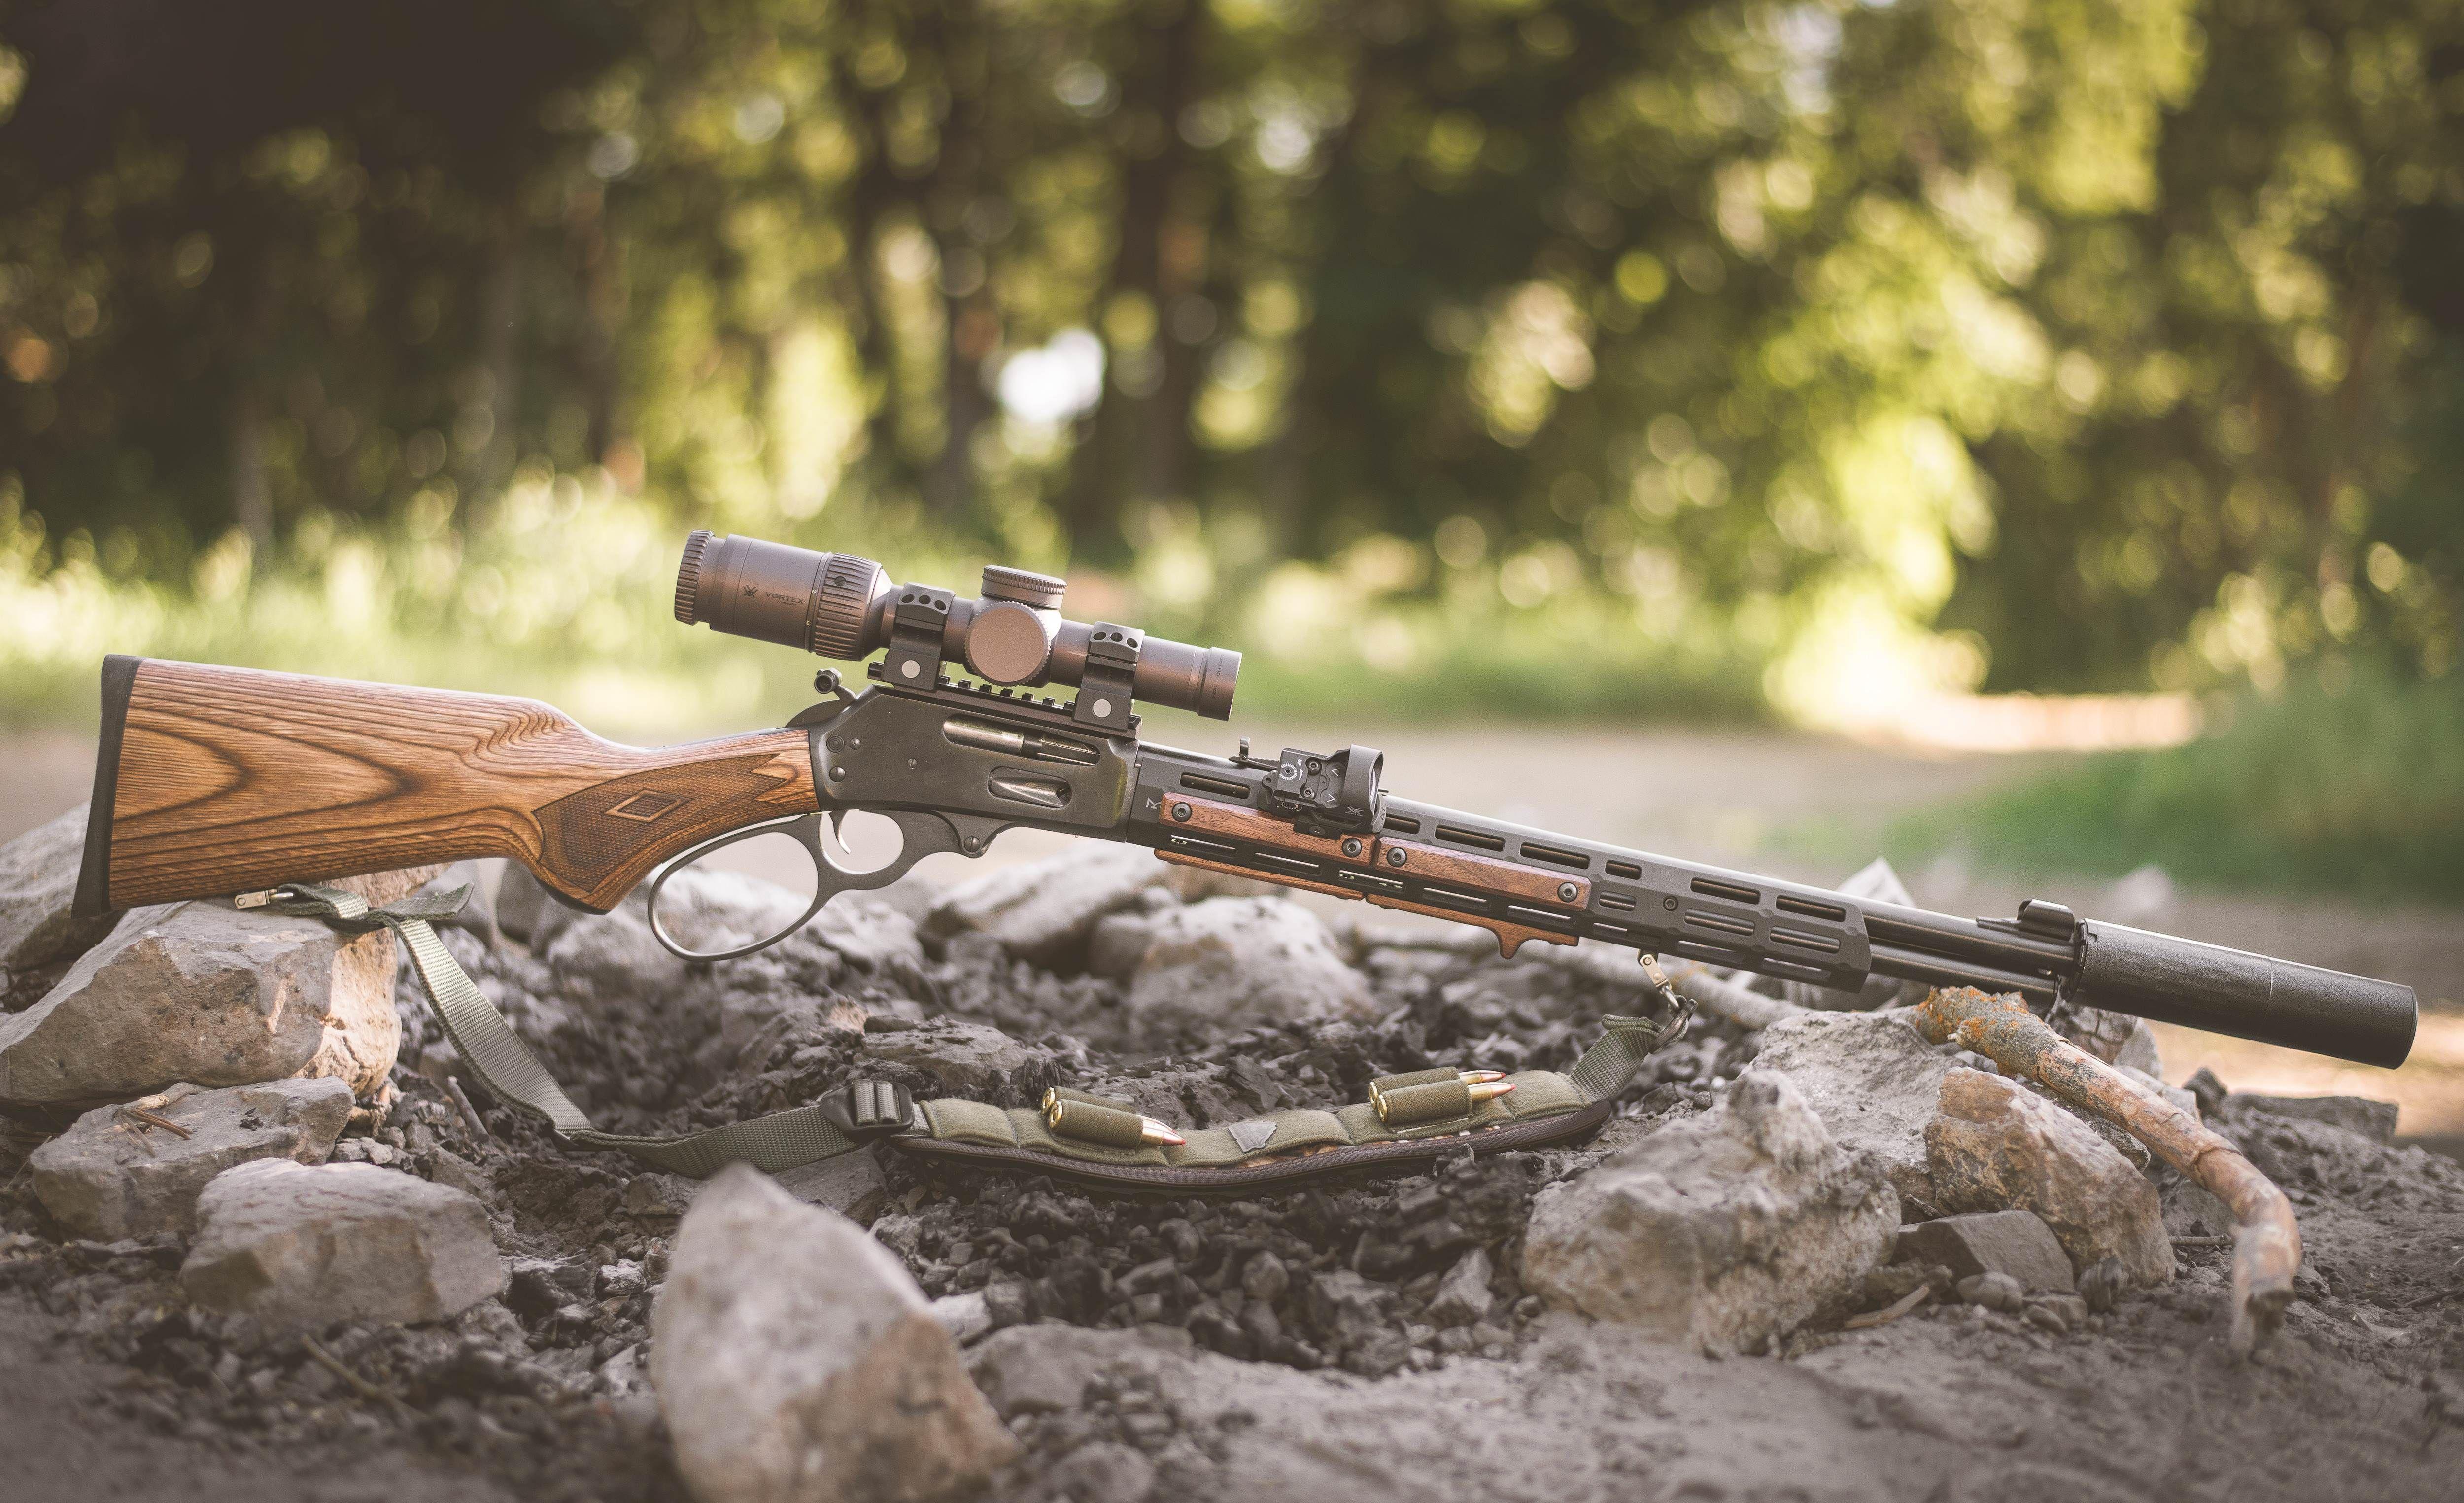 Pin by Erik Anderson on Guns   Guns, Lever action rifles